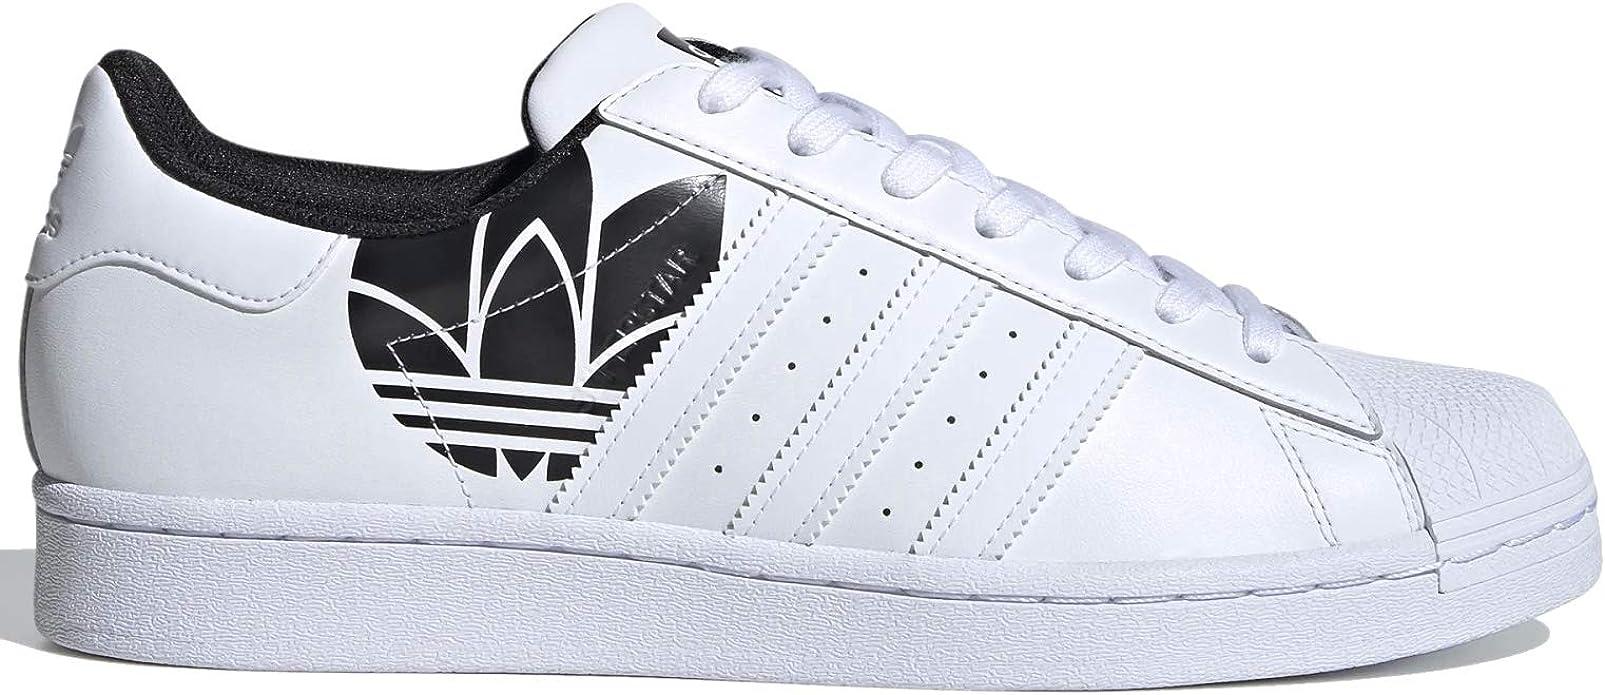 adidas Originals Superstar Mens Casual